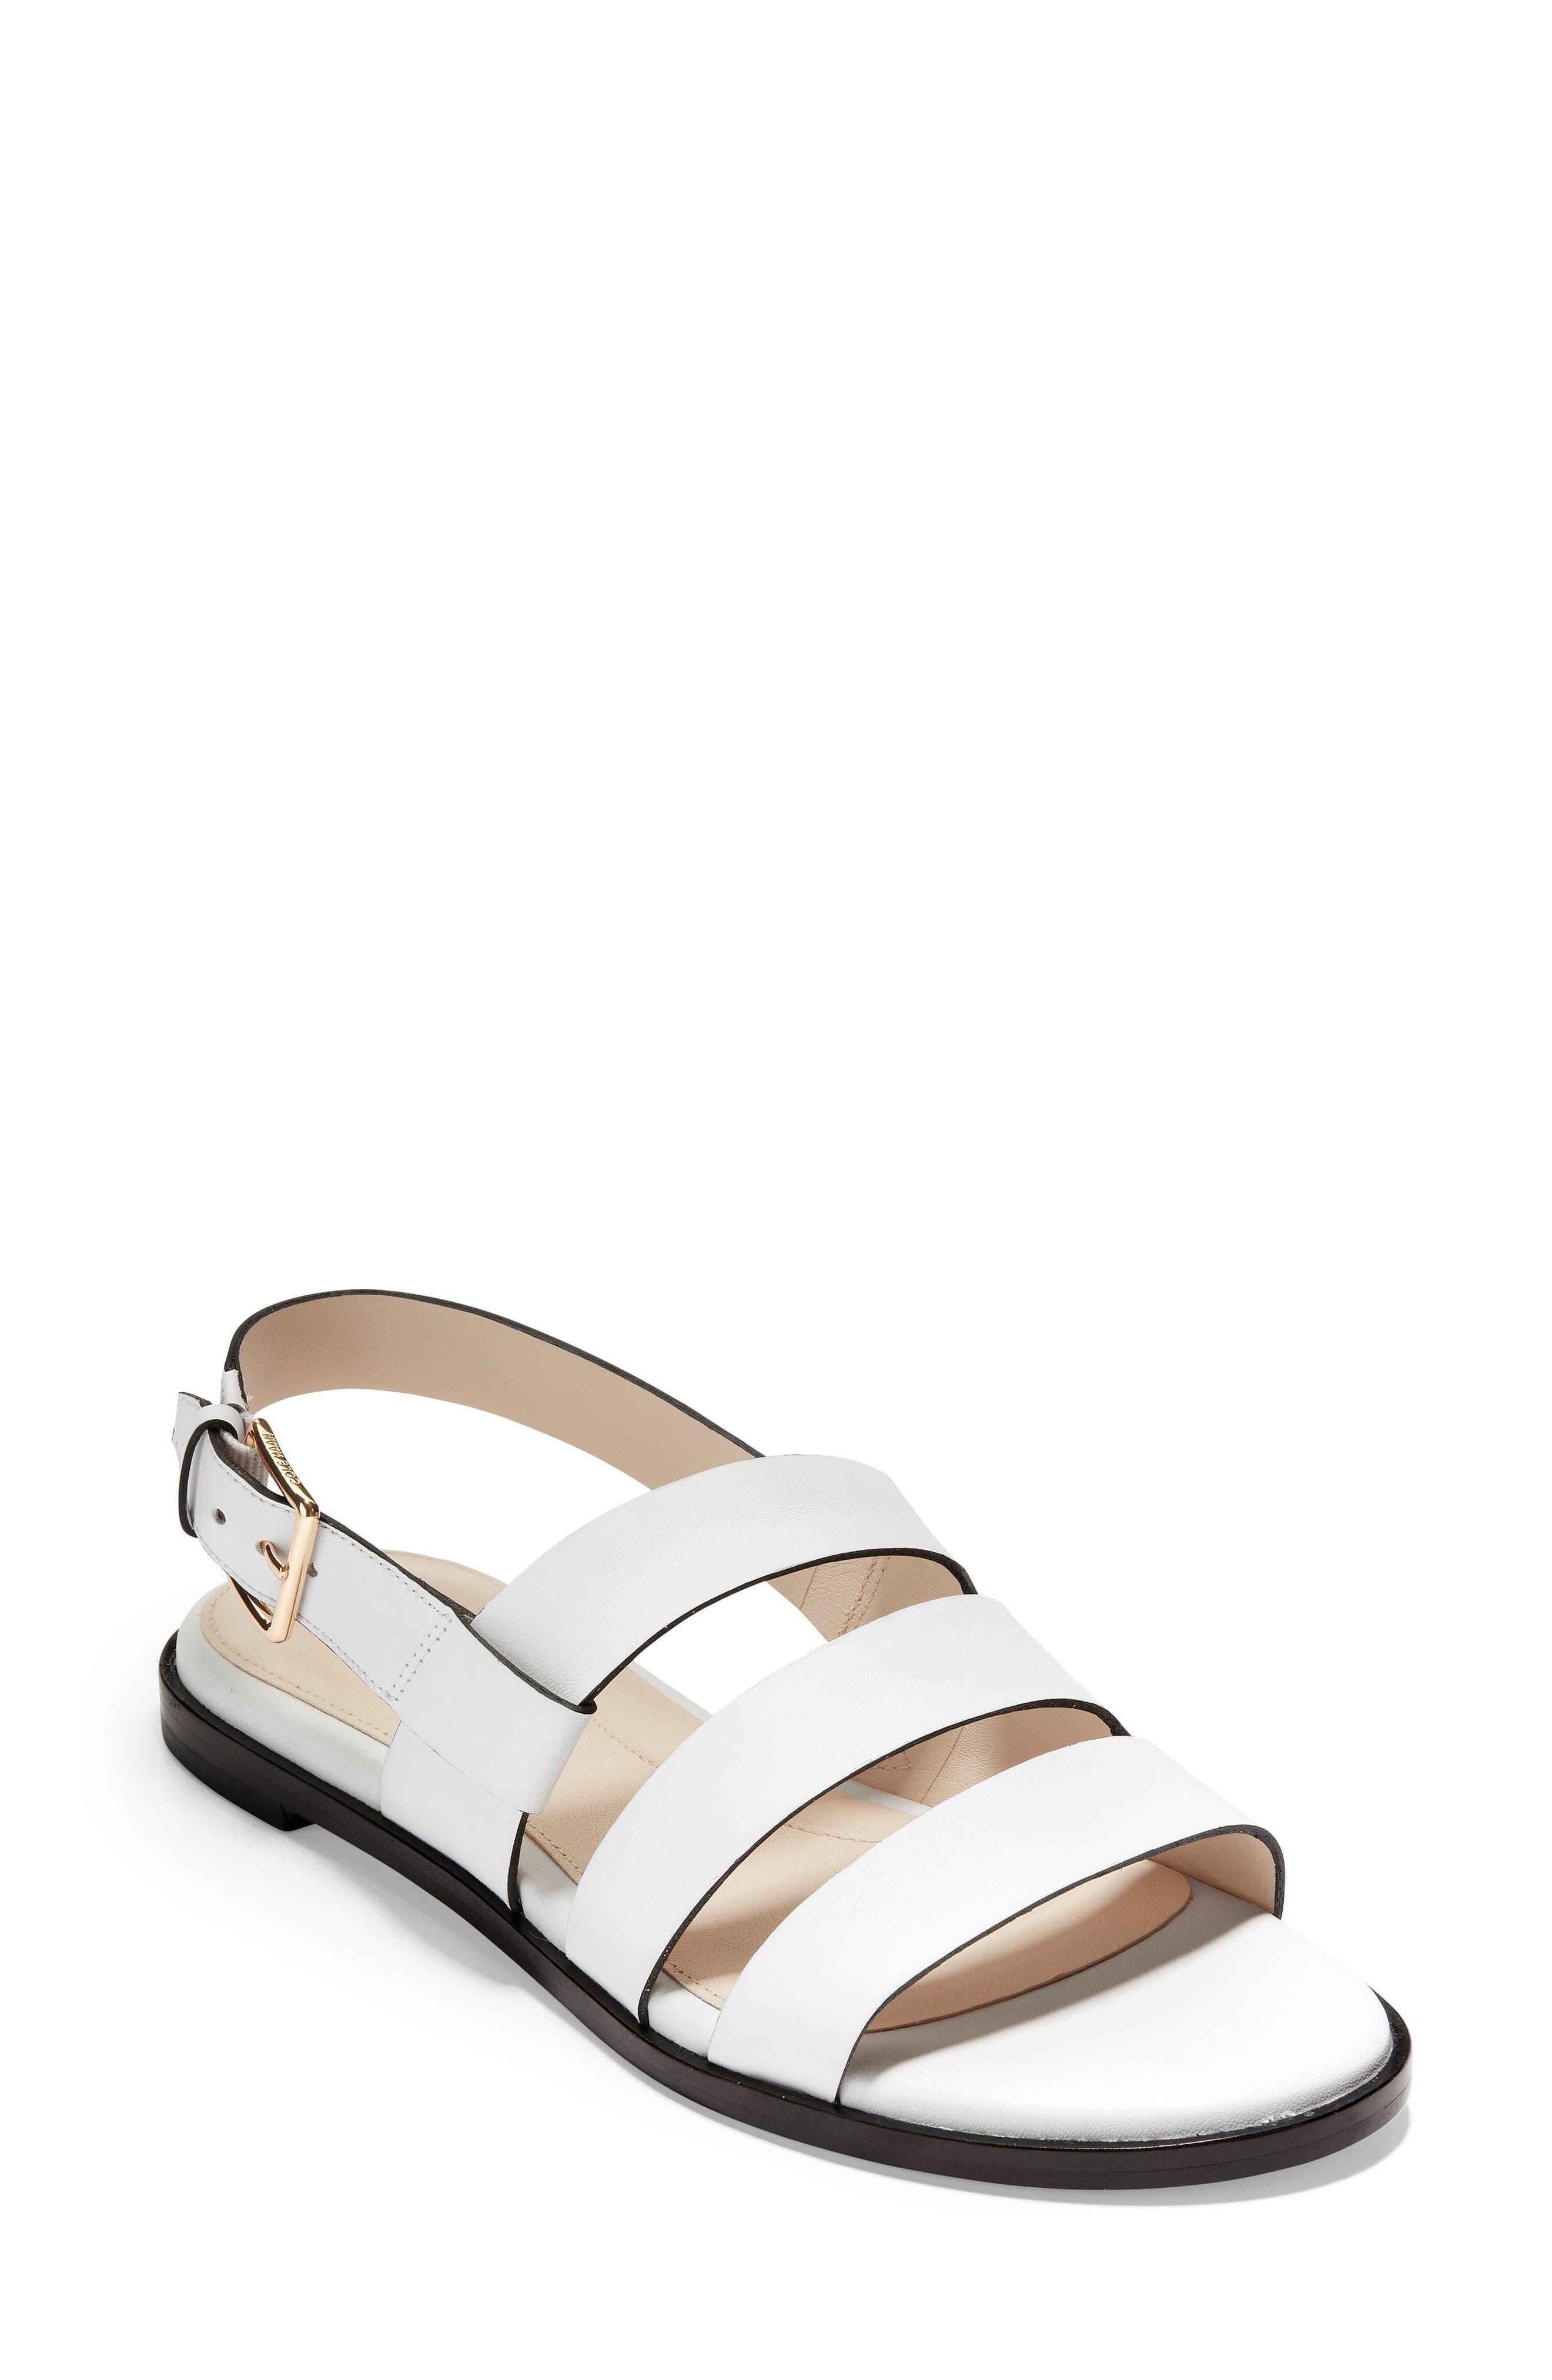 Cole Haan Anela Sandal B - White